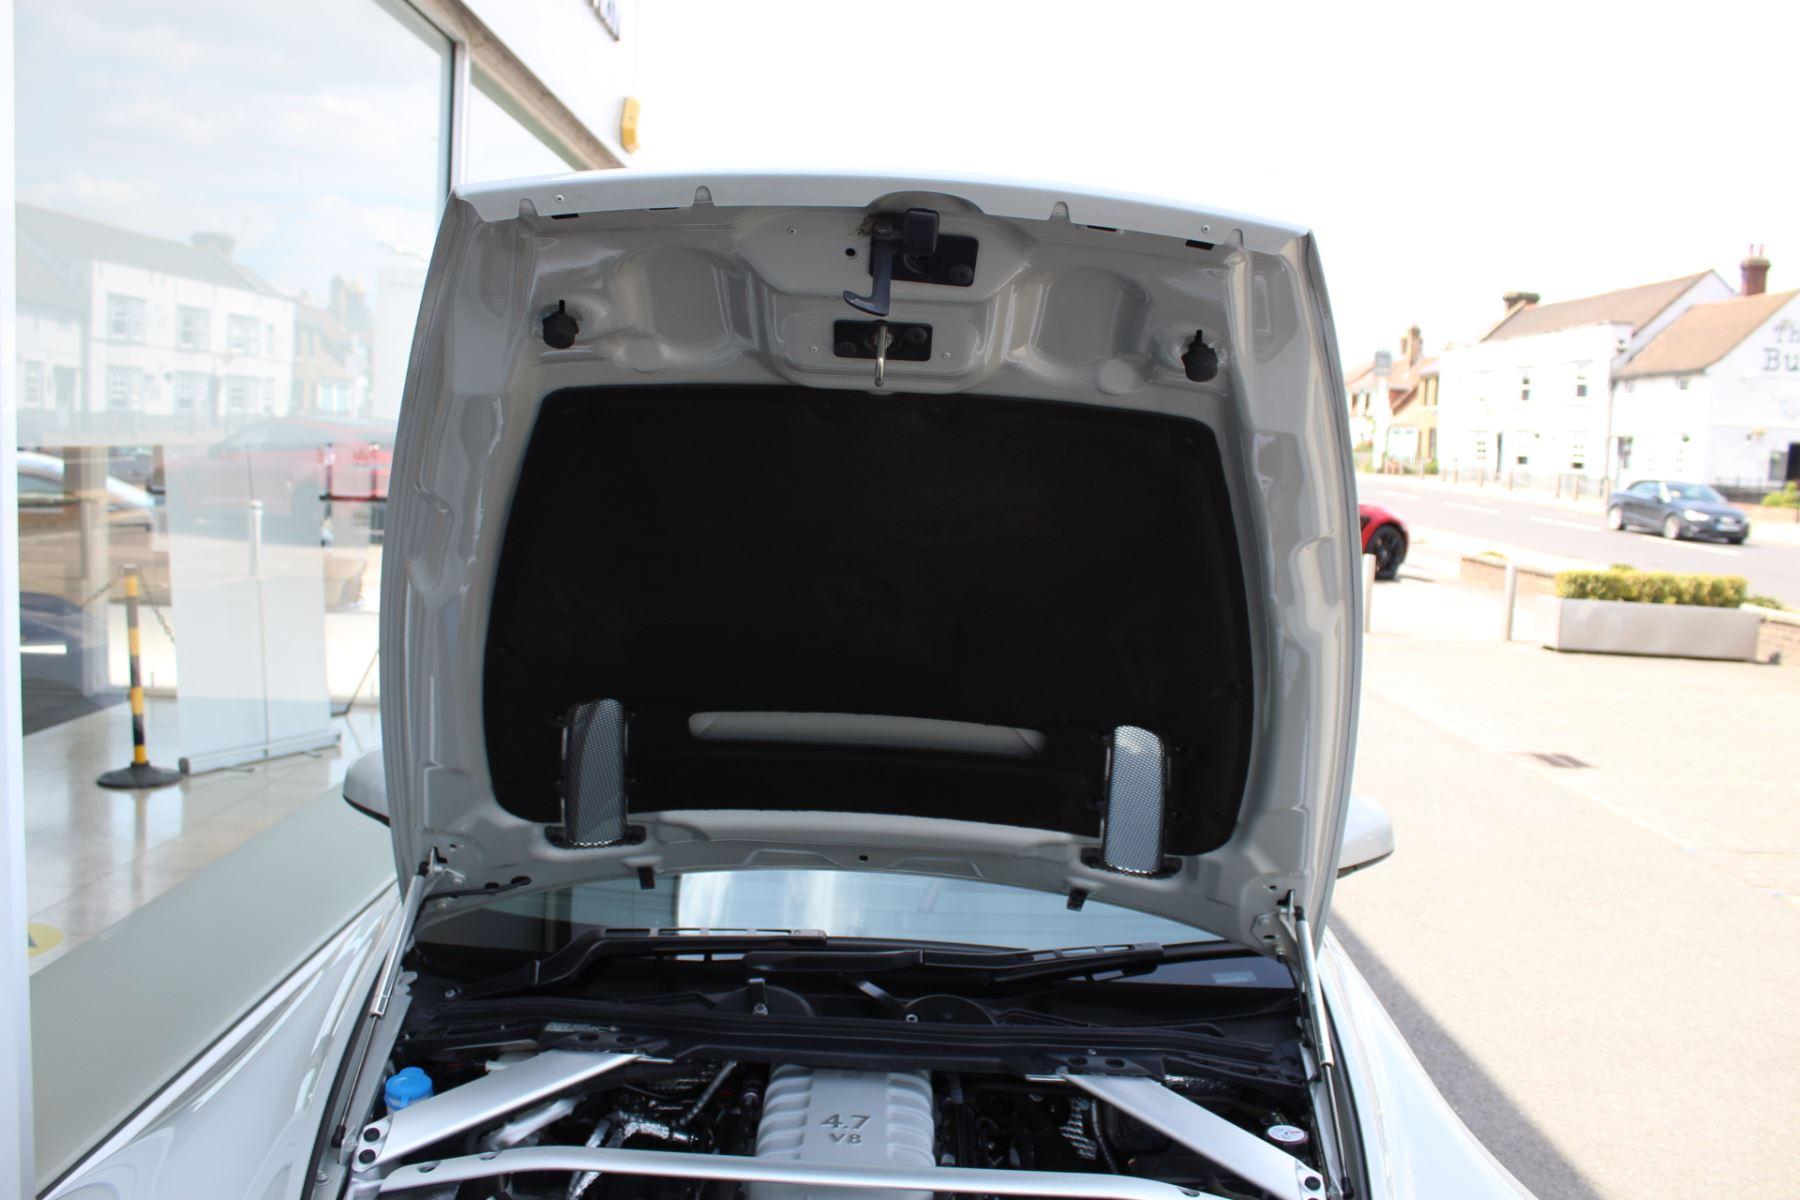 Aston Martin V8 Vantage Coupe 2dr [420] Latest Dash, 420BHP image 22